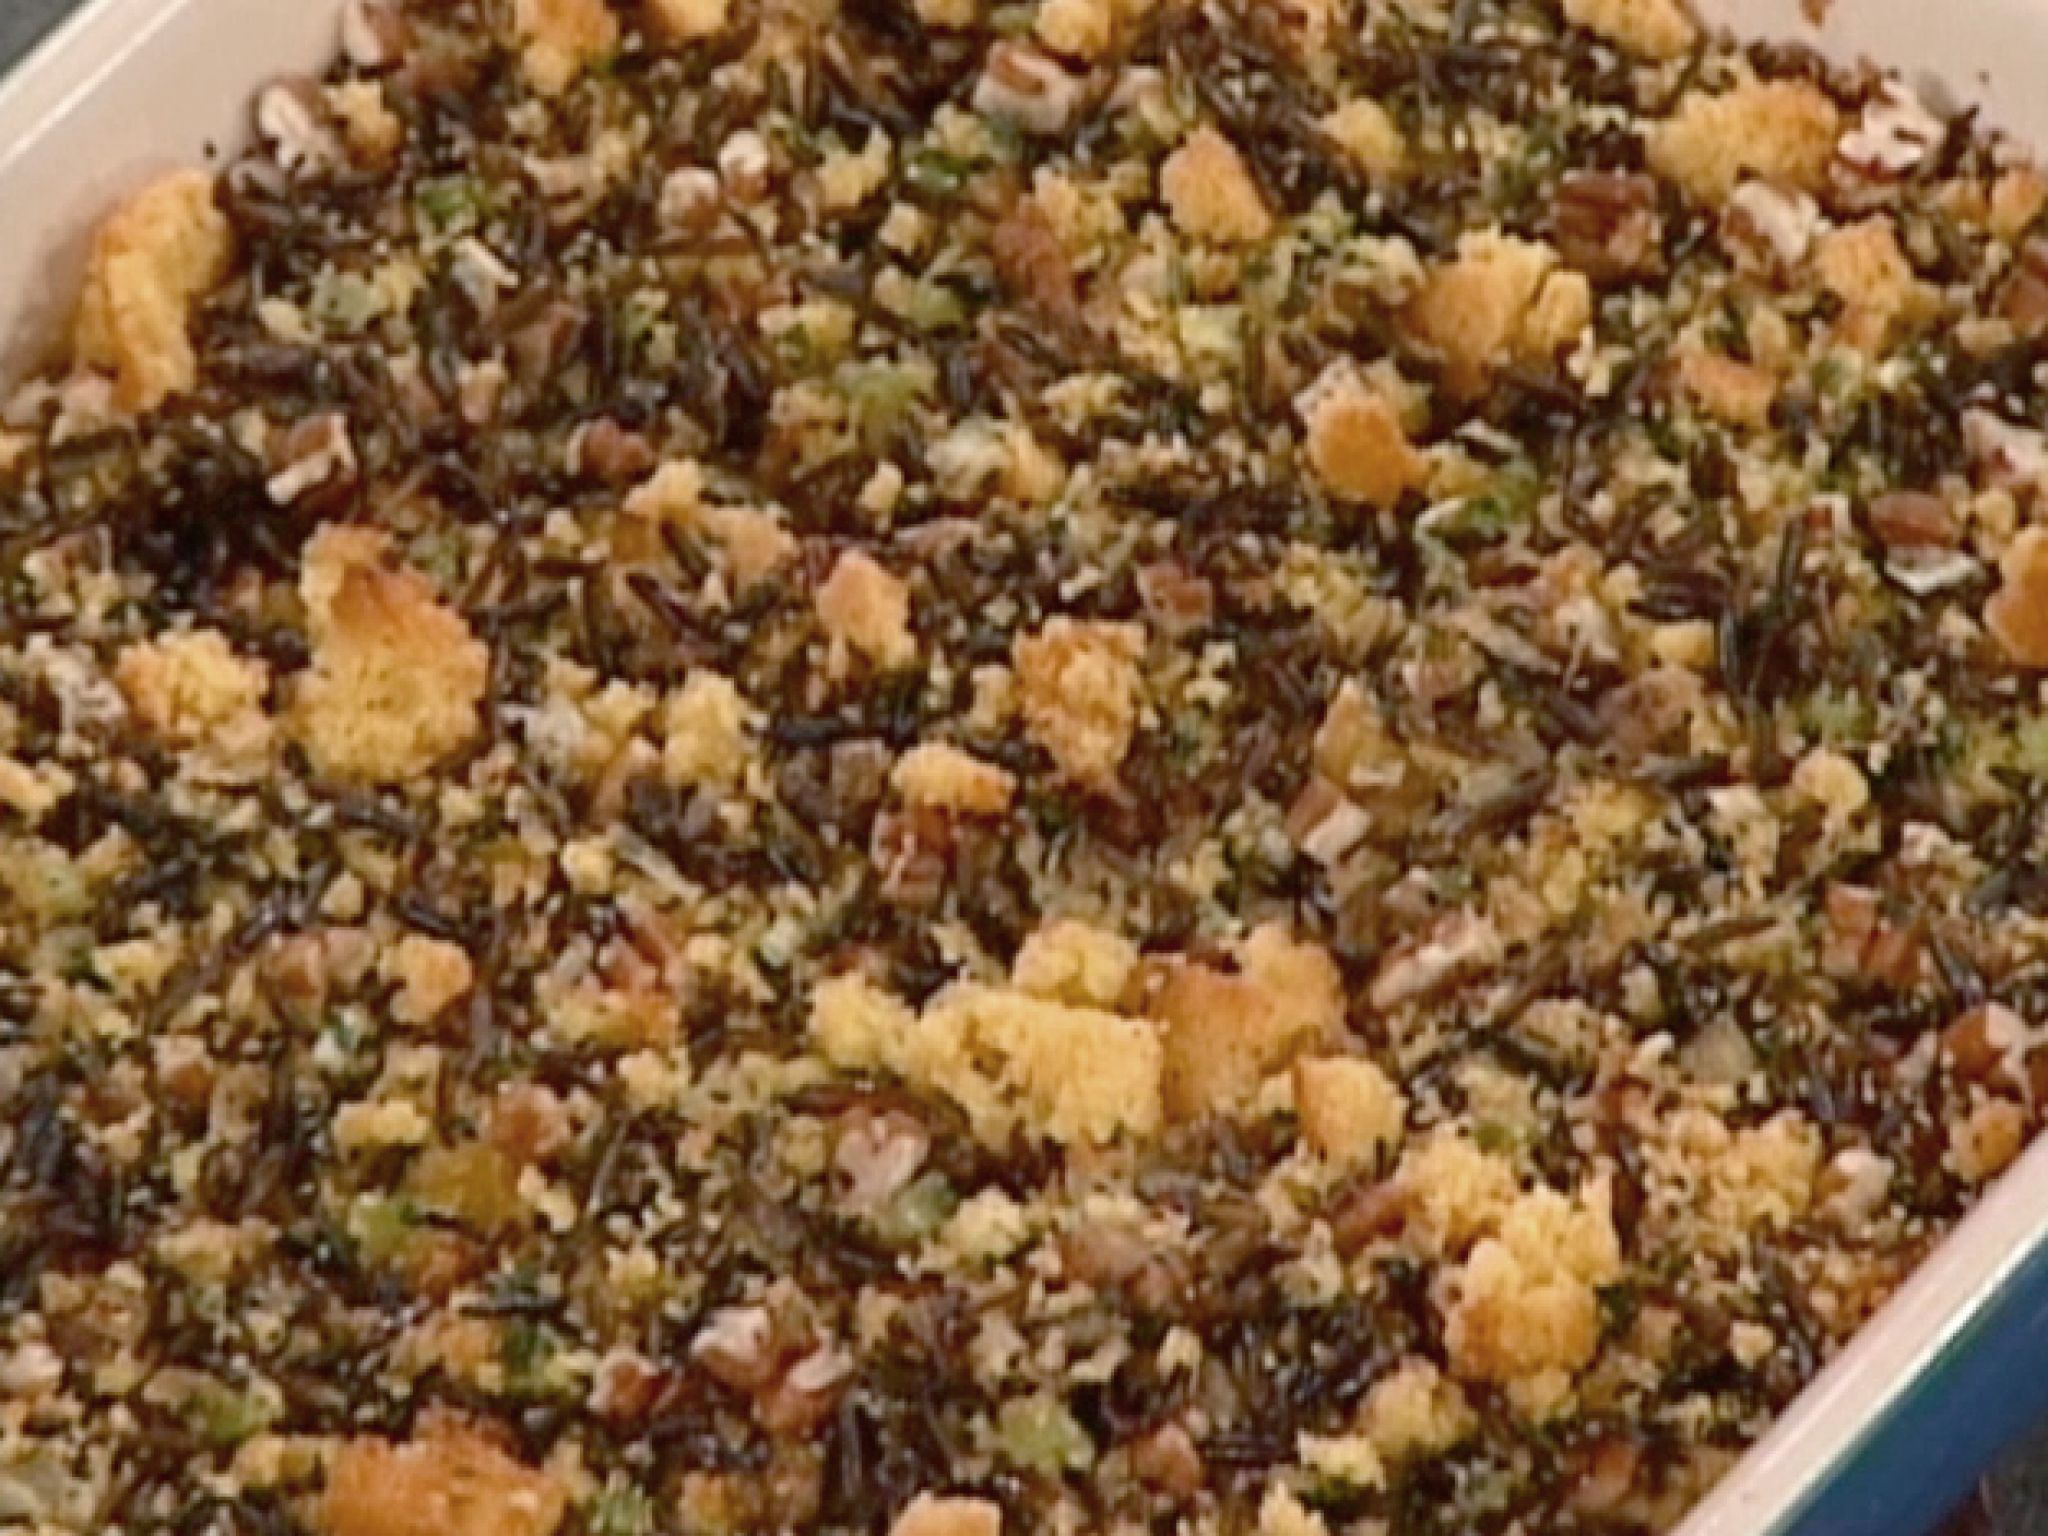 Wild Rice and Cornbread Dressing recipe from Emeril